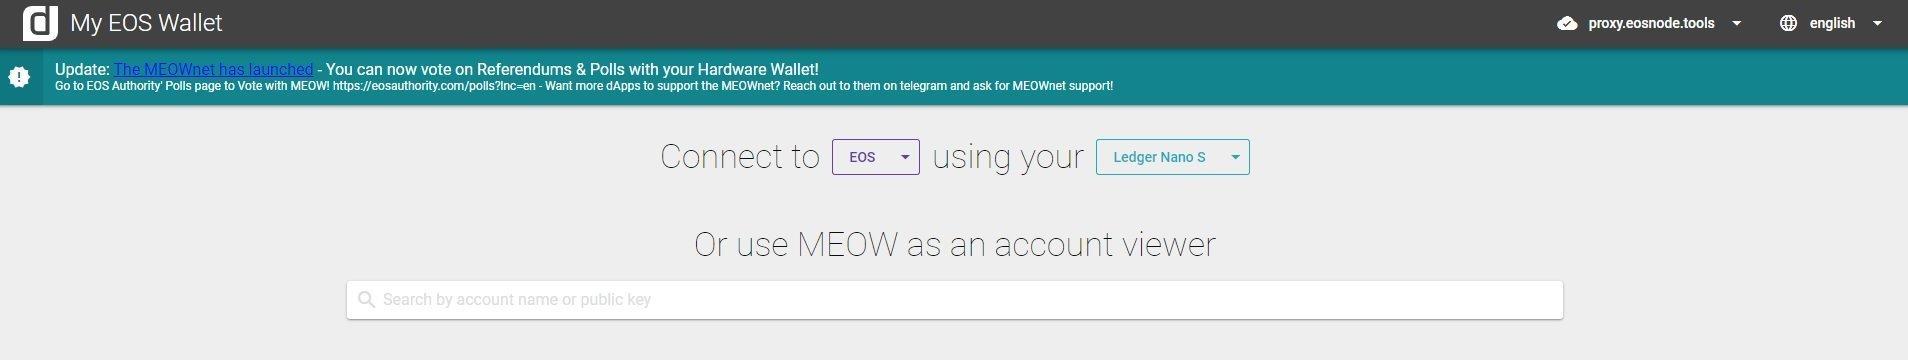 MyEOSWallet Web Wallet per EOS